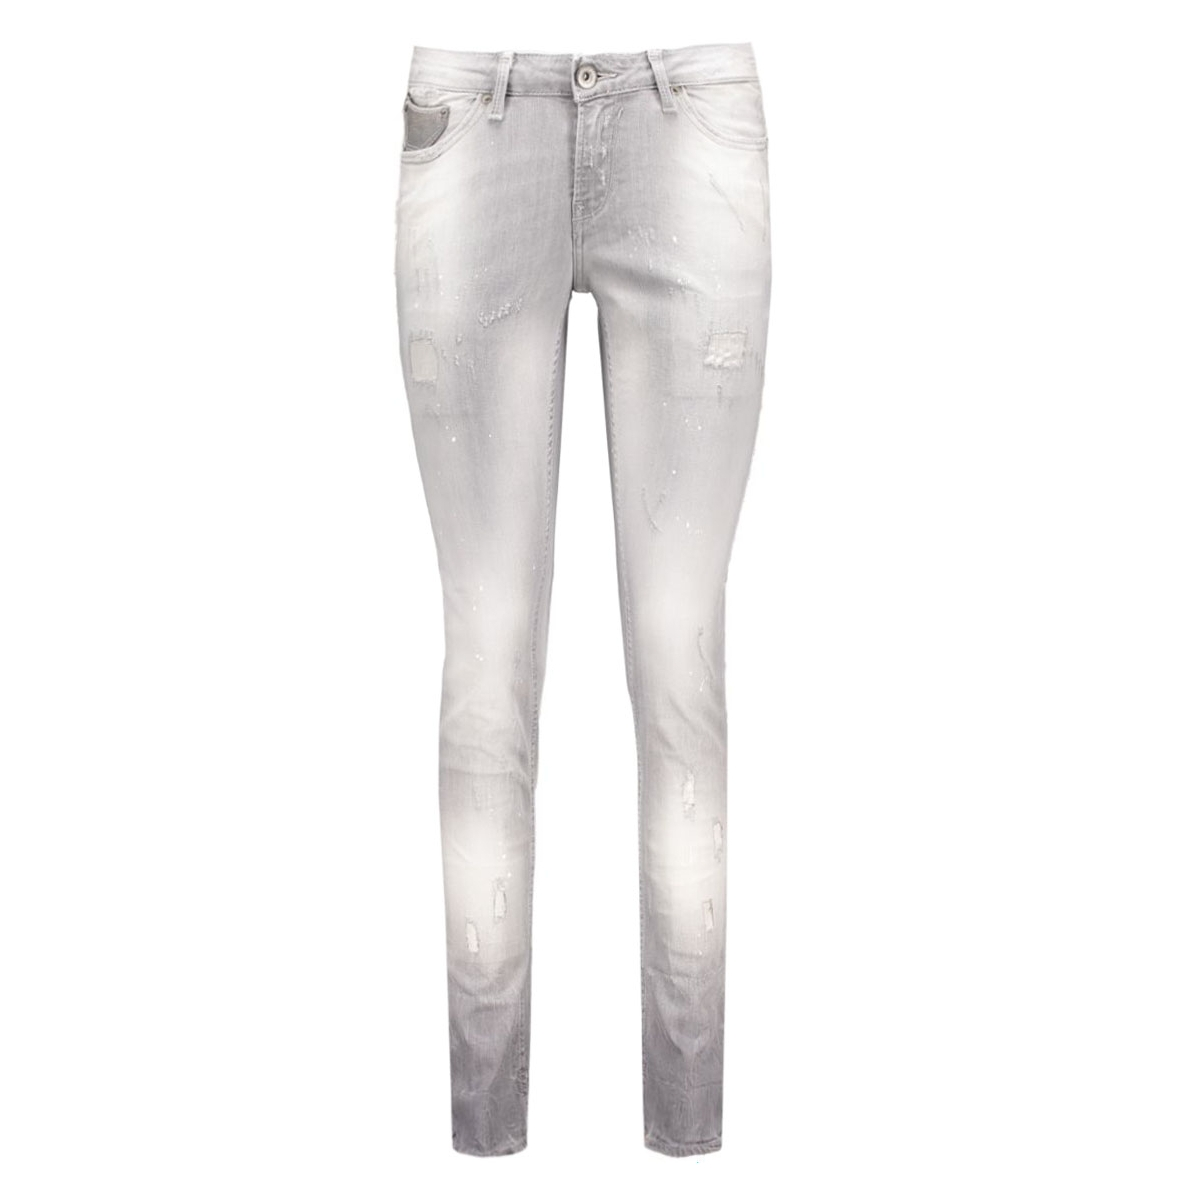 s60111 garcia jeans 1717 vint. grey